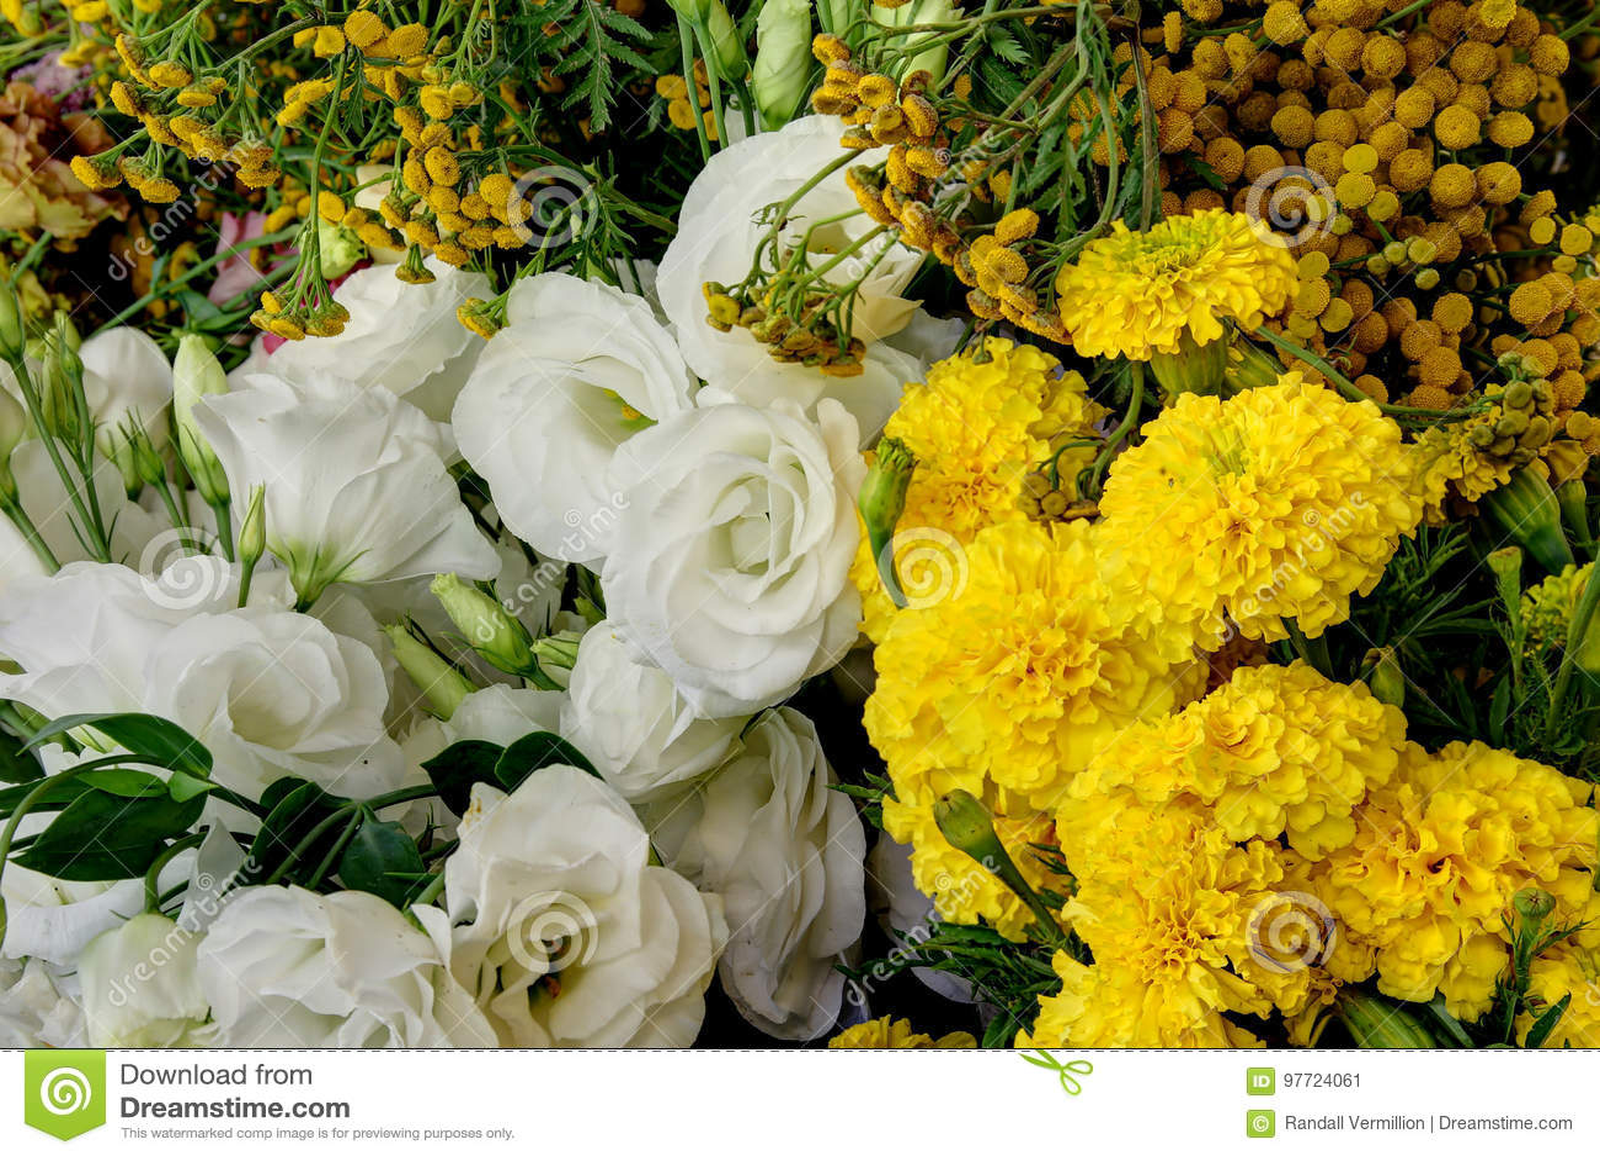 Flower Farm Fresh Picked Flowers Stock Image Image Of White